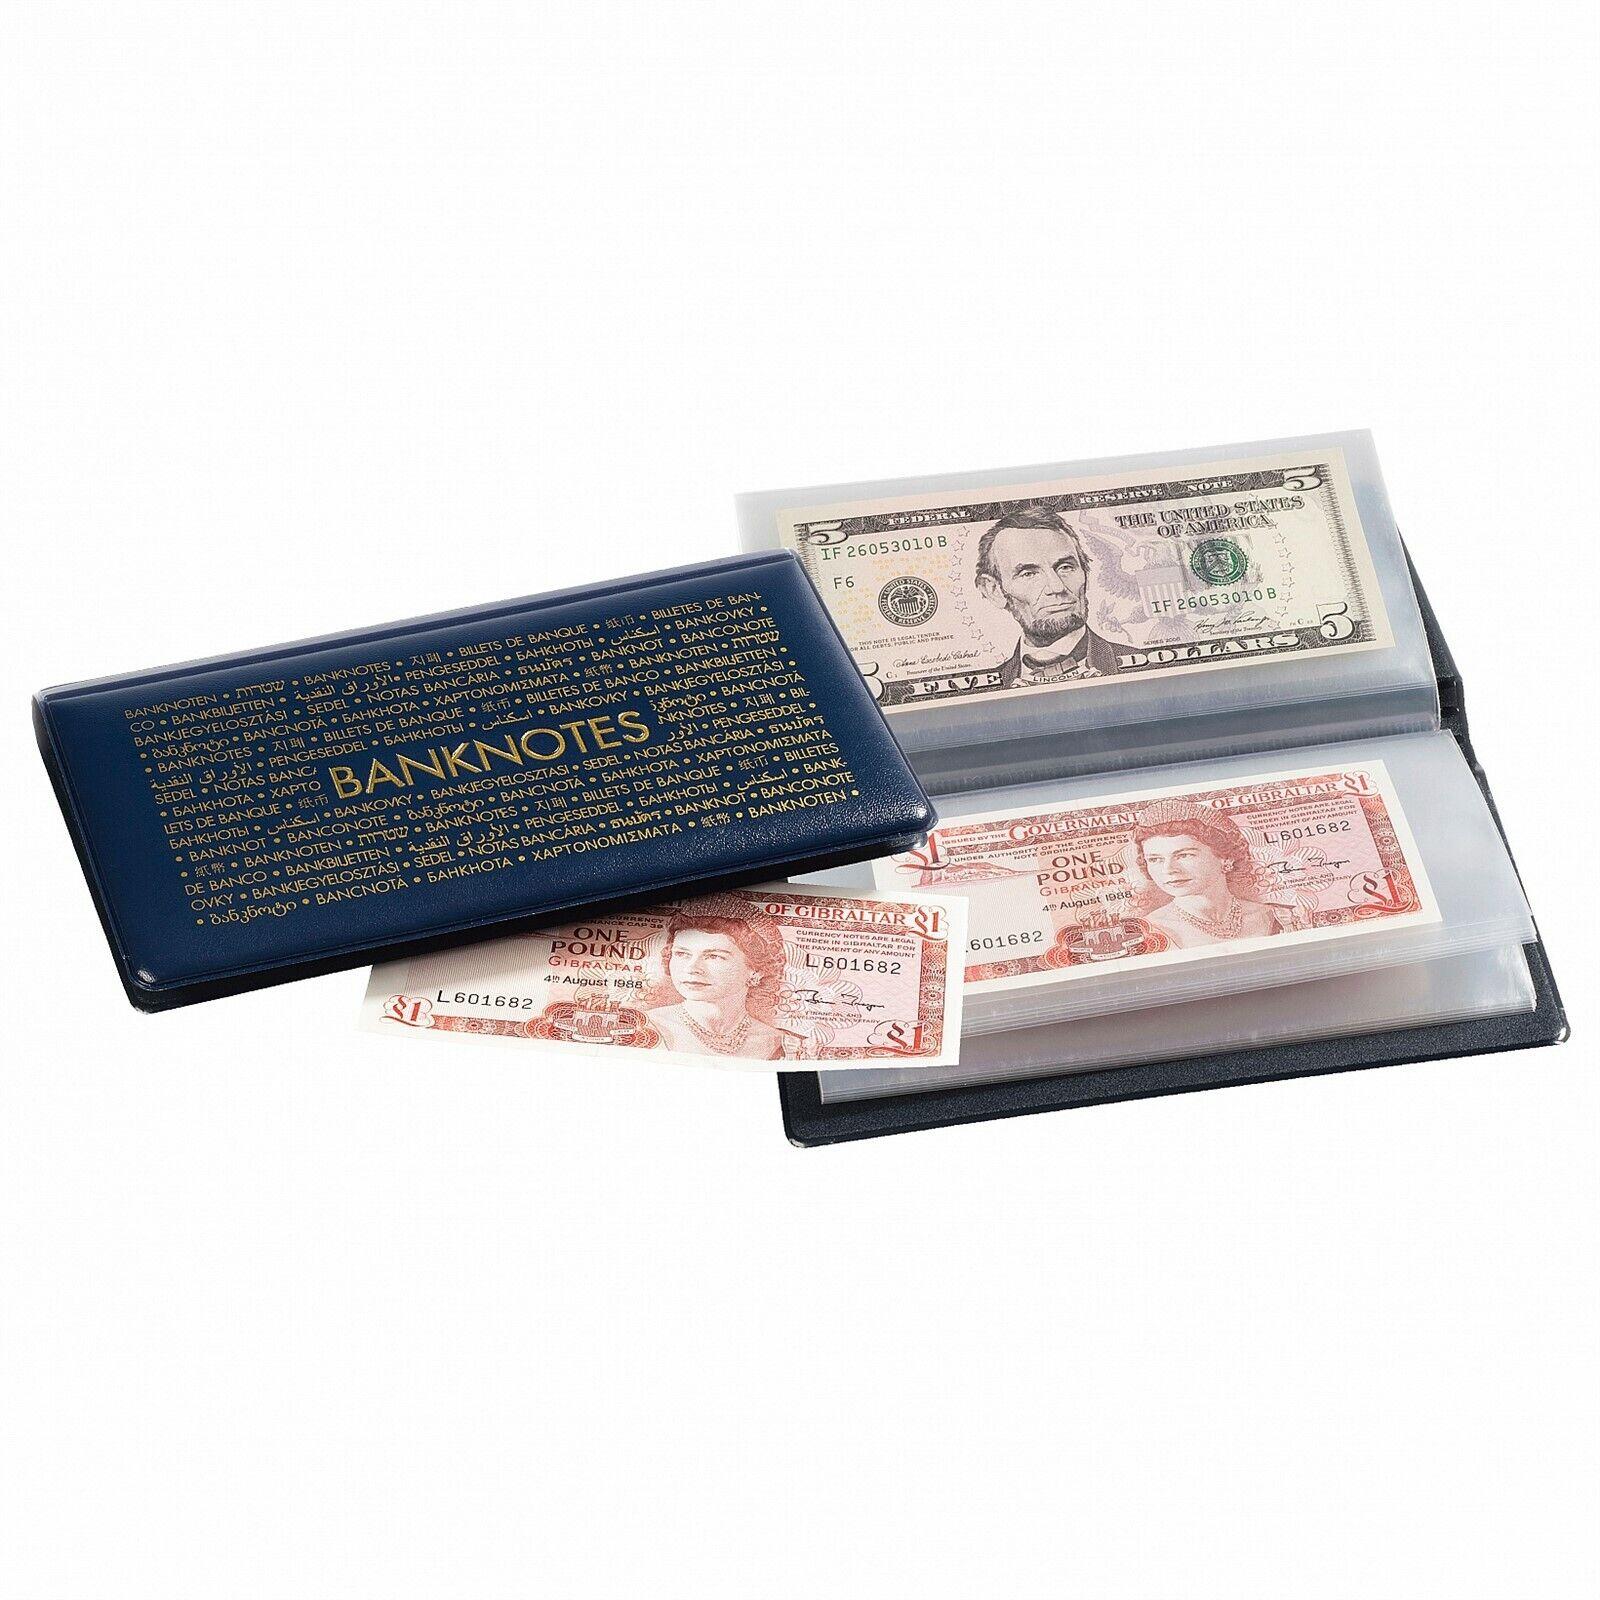 3 Lighthouse Banknotes Pocket Album Wallet Dollar Bills Currency Paper Money